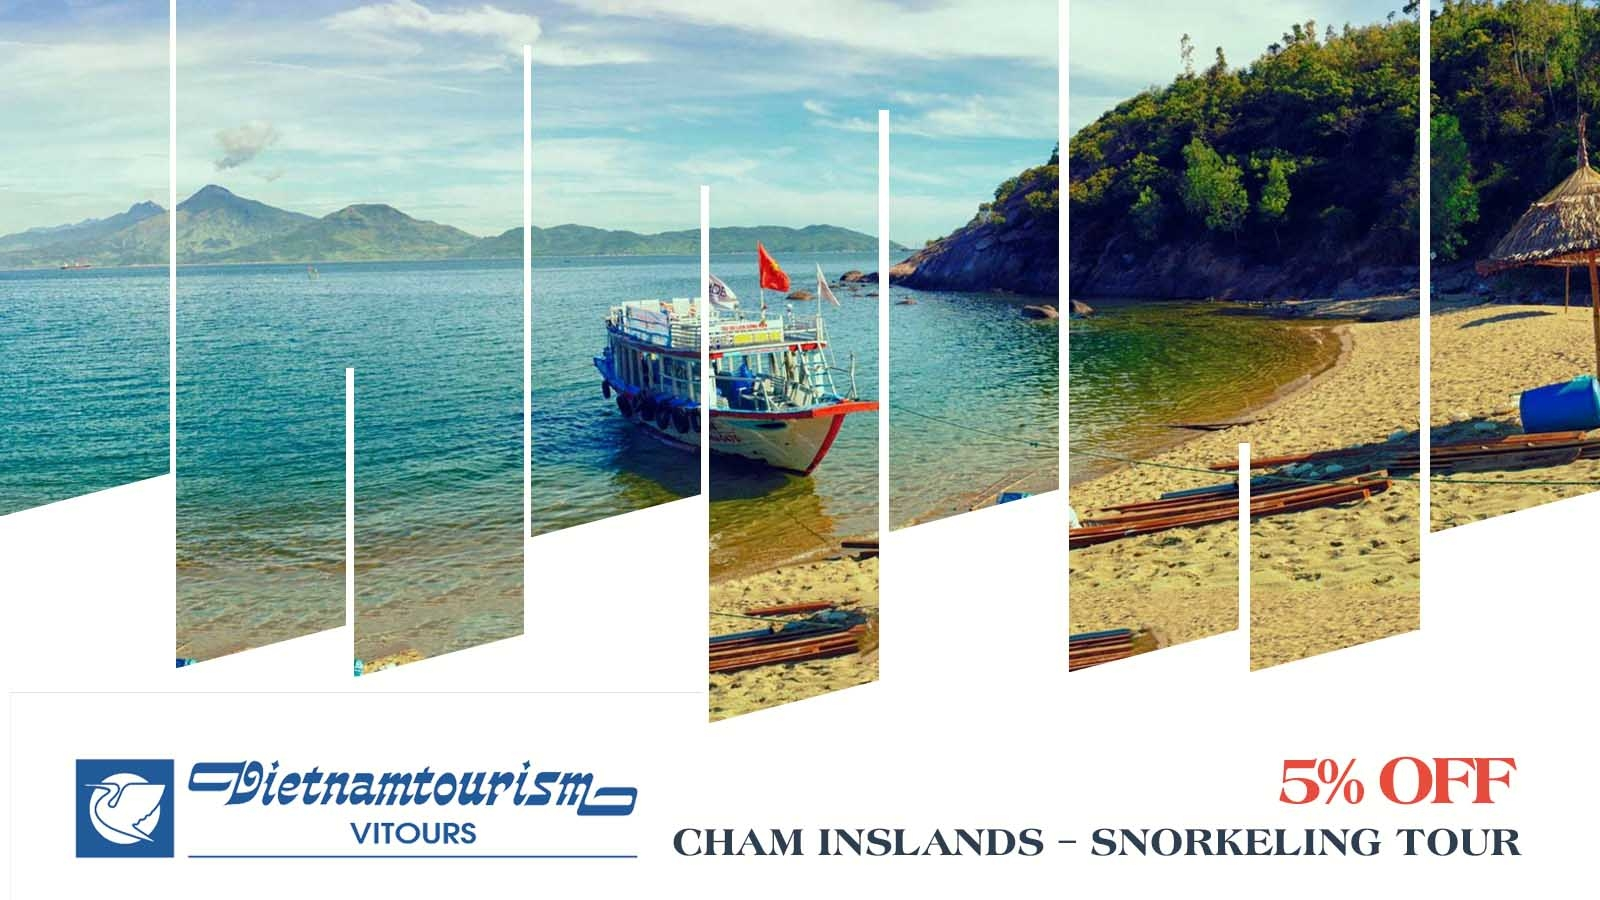 Vitours 5% OFF Cham Islands – Snorkeling Tour 1